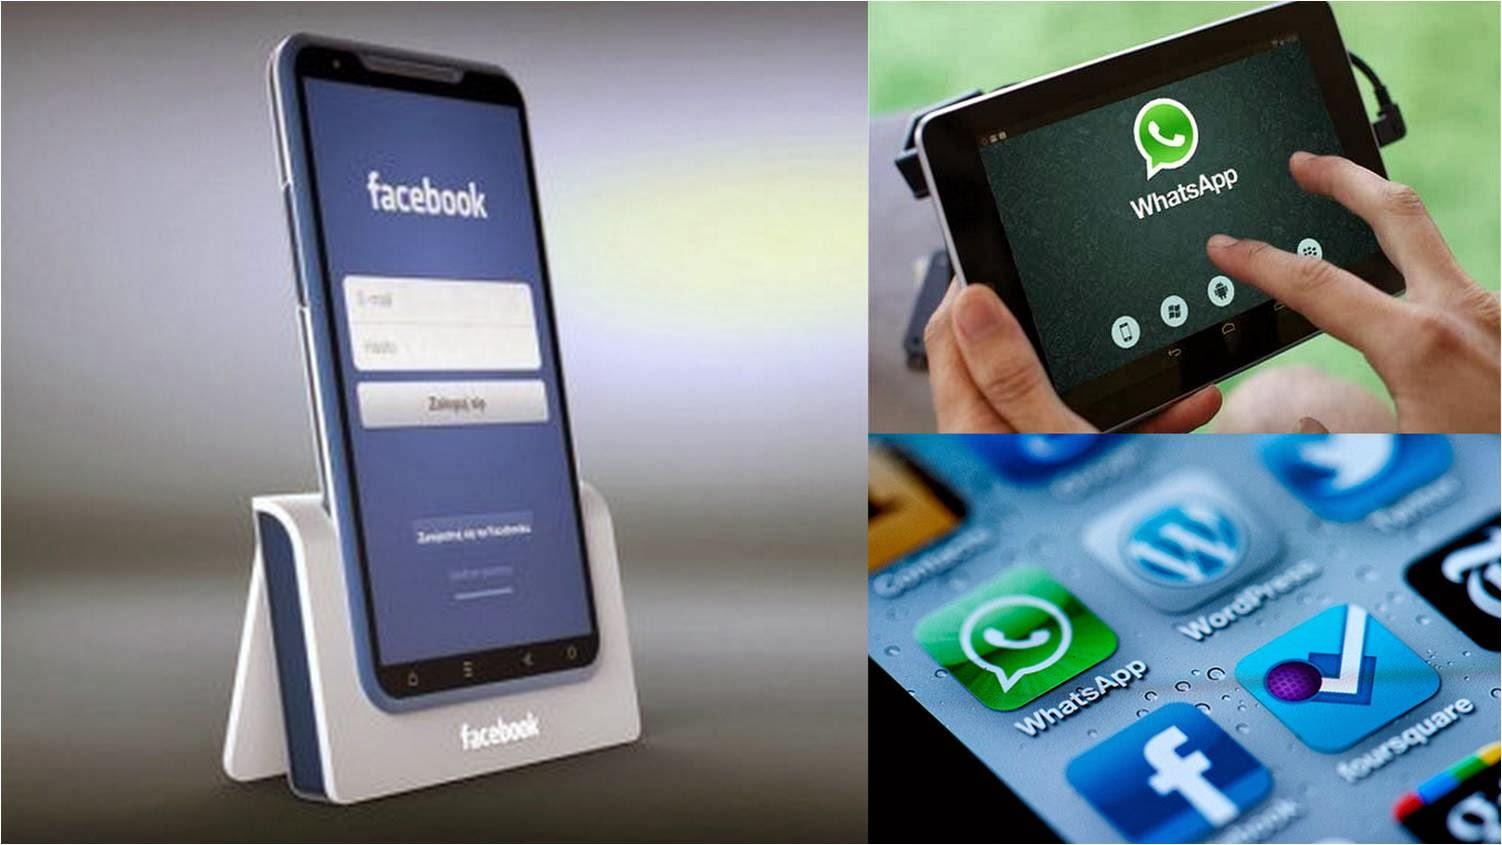 Acquisition of WhatsApp by Mark Zuckerberg